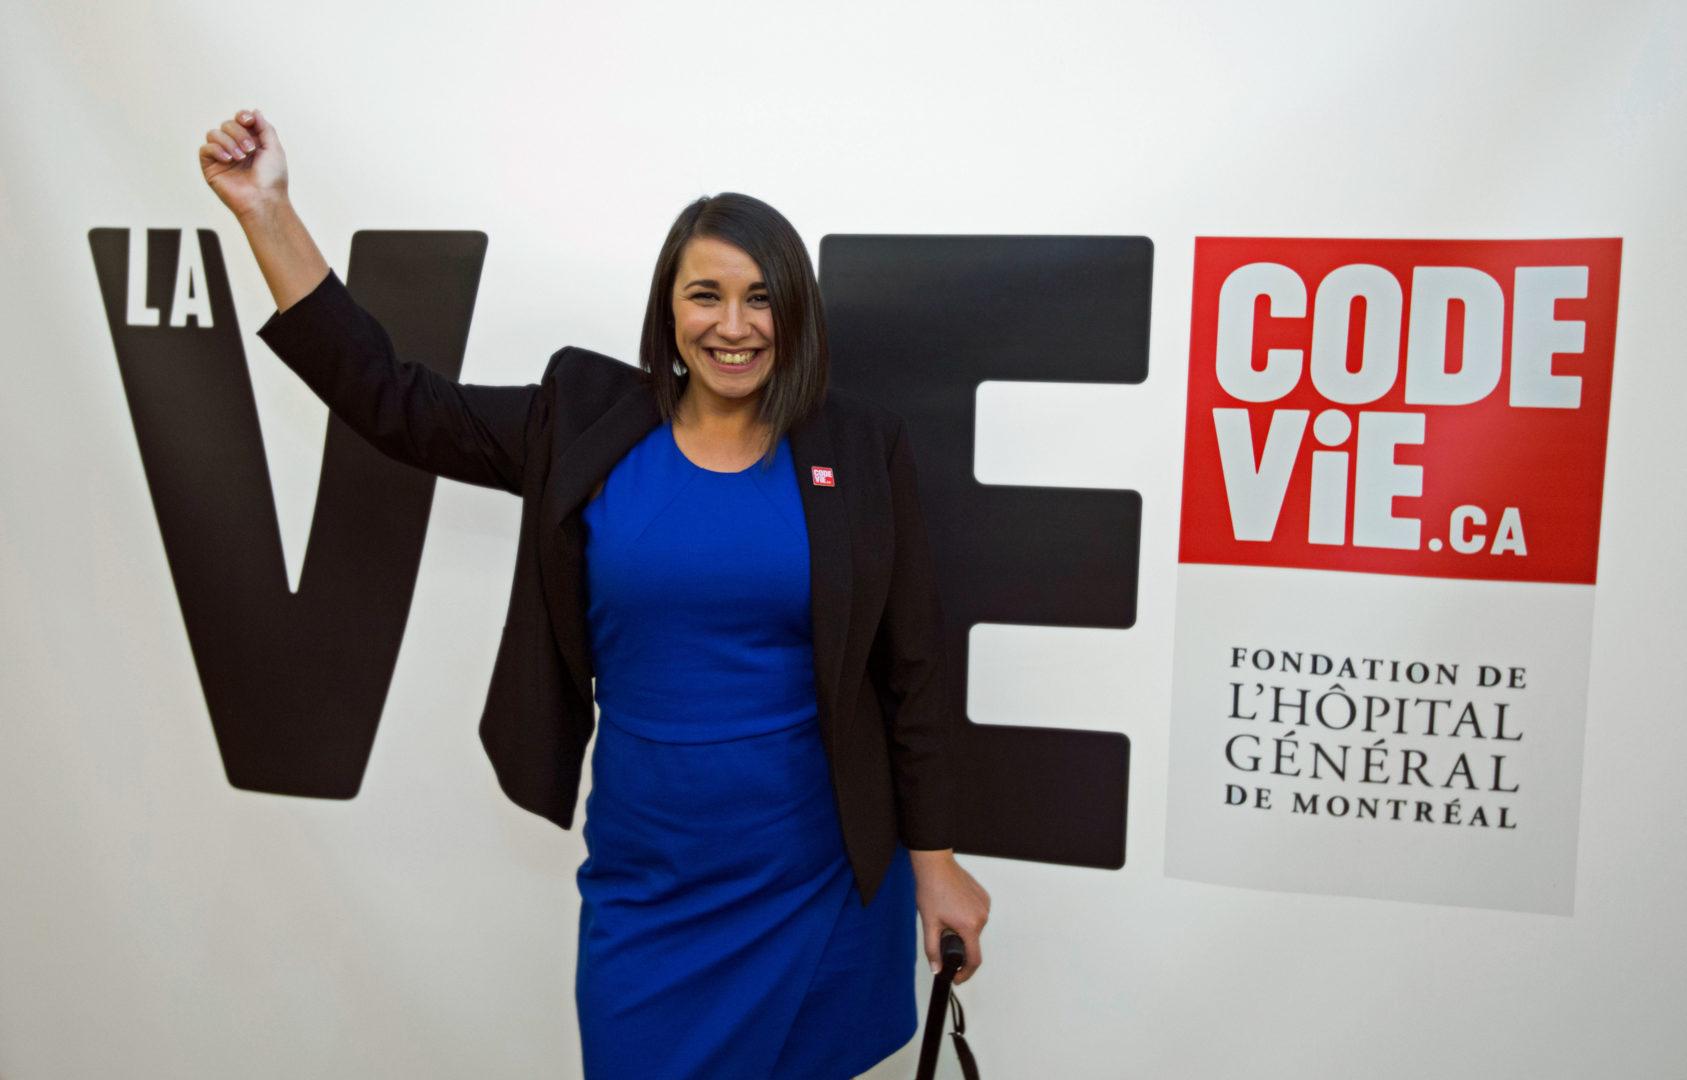 Annie-Claude, proud Code Life ambassador